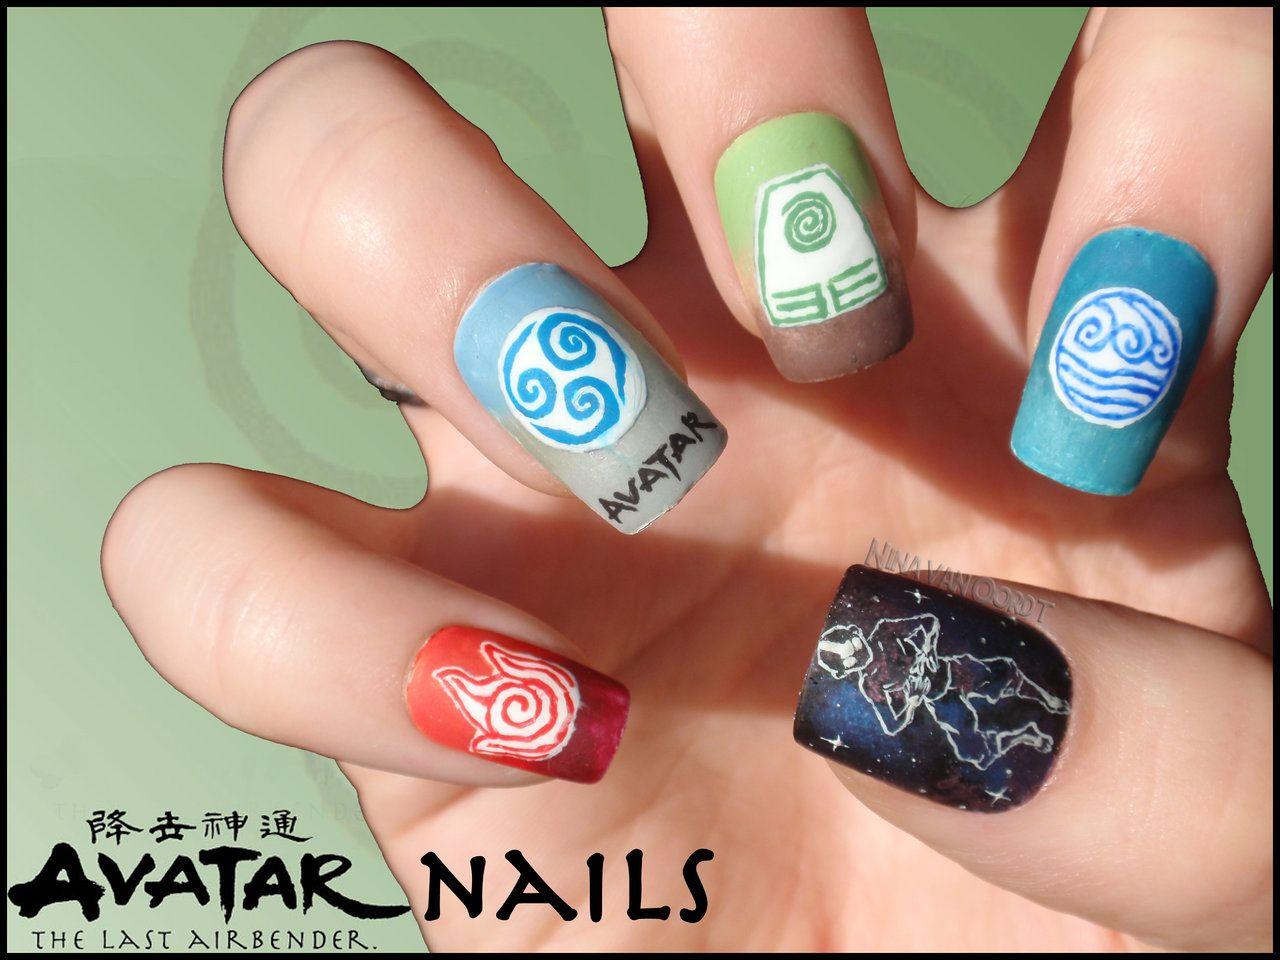 Anime Nails on Geek-Nails - DeviantArt - The 25+ Best Anime Nails Ideas On Pinterest Sailor Moon Nails